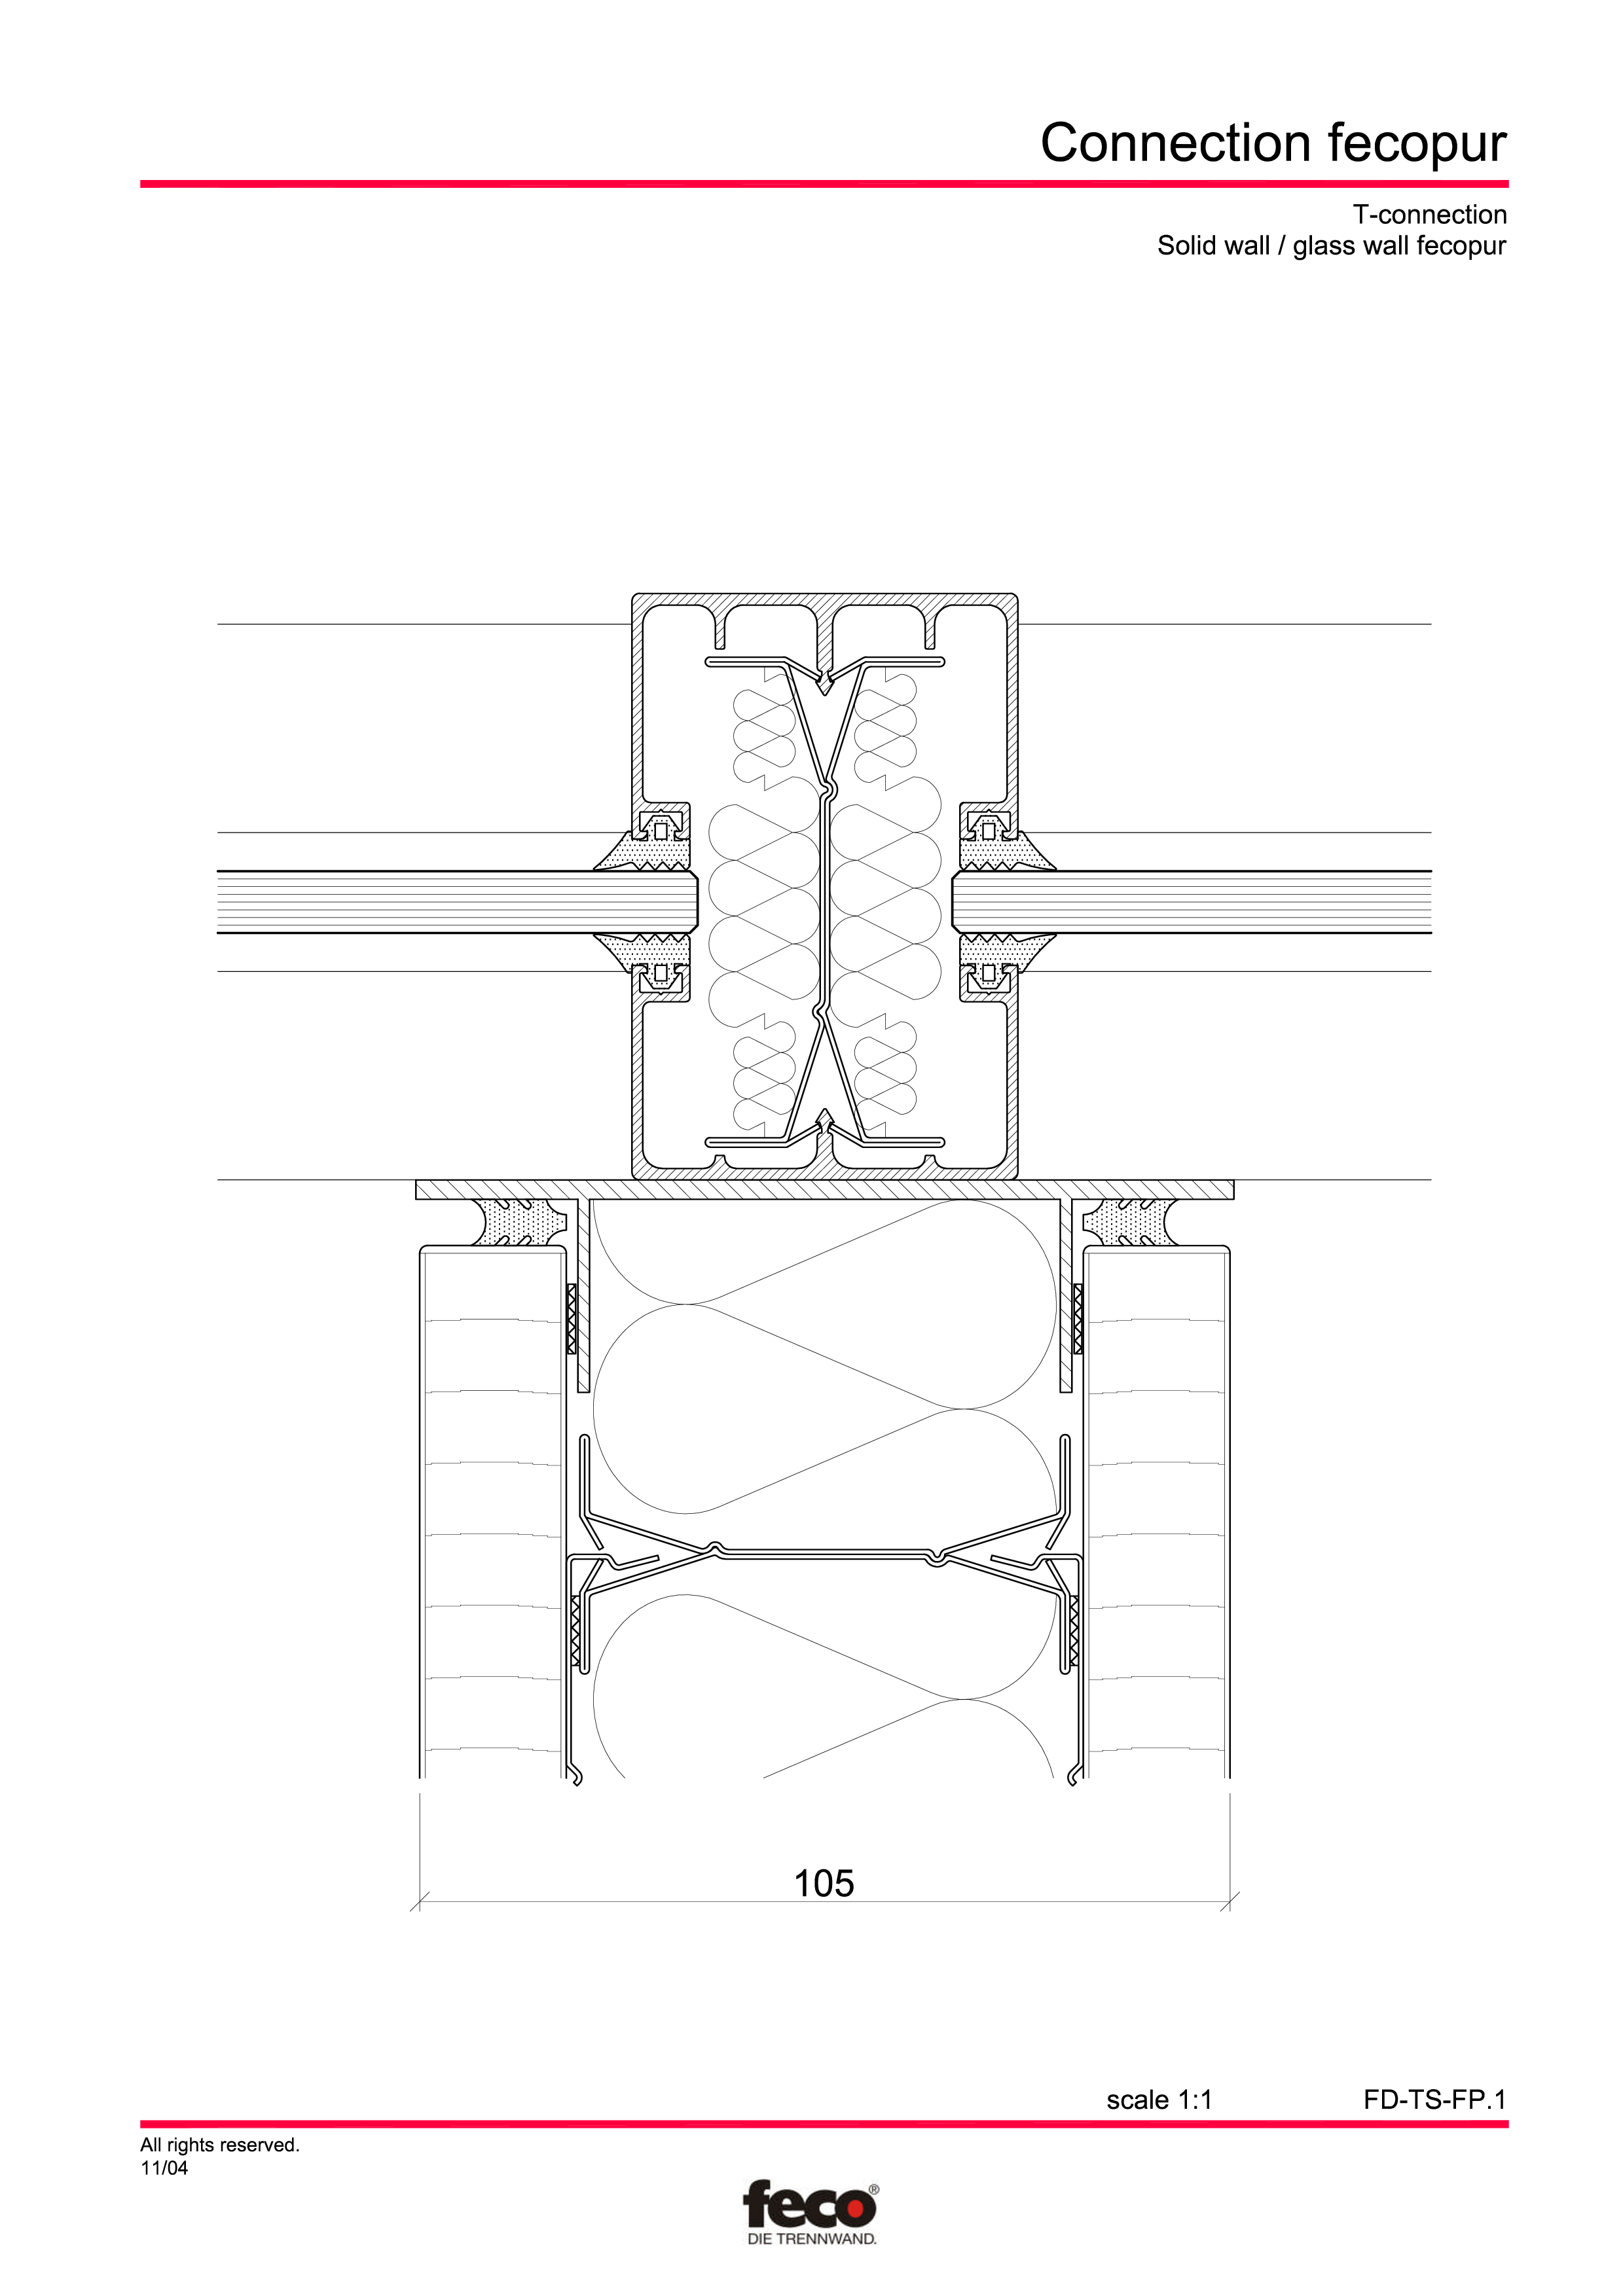 Pagina 3 - CAD-PDF Detaliu racord pereti FECO Detaliu de montaj FecoPur, FecoFix, FecoLux